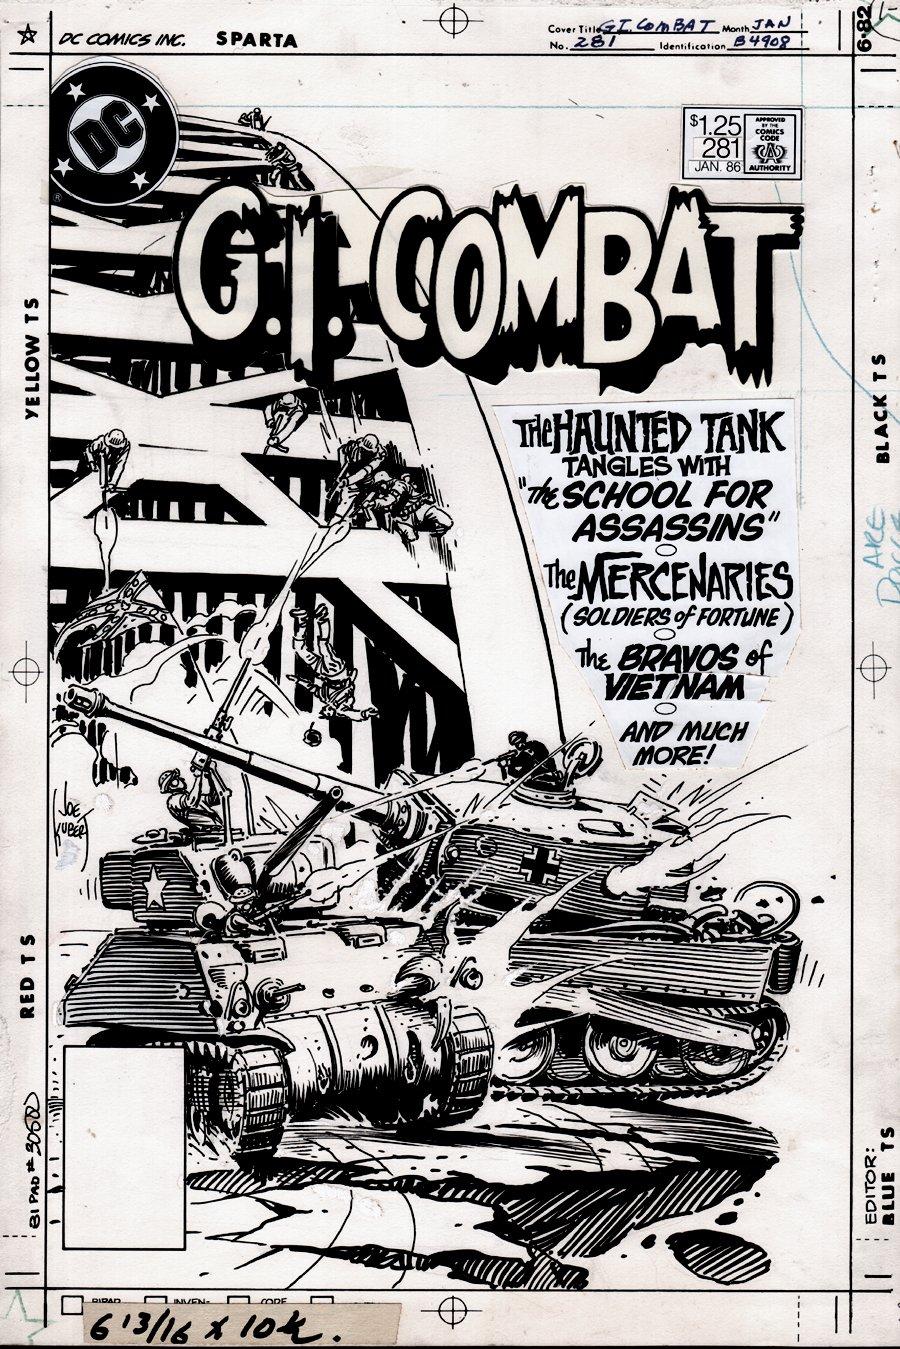 G.I. Combat #281 Cover (HAUNTED TANK!)